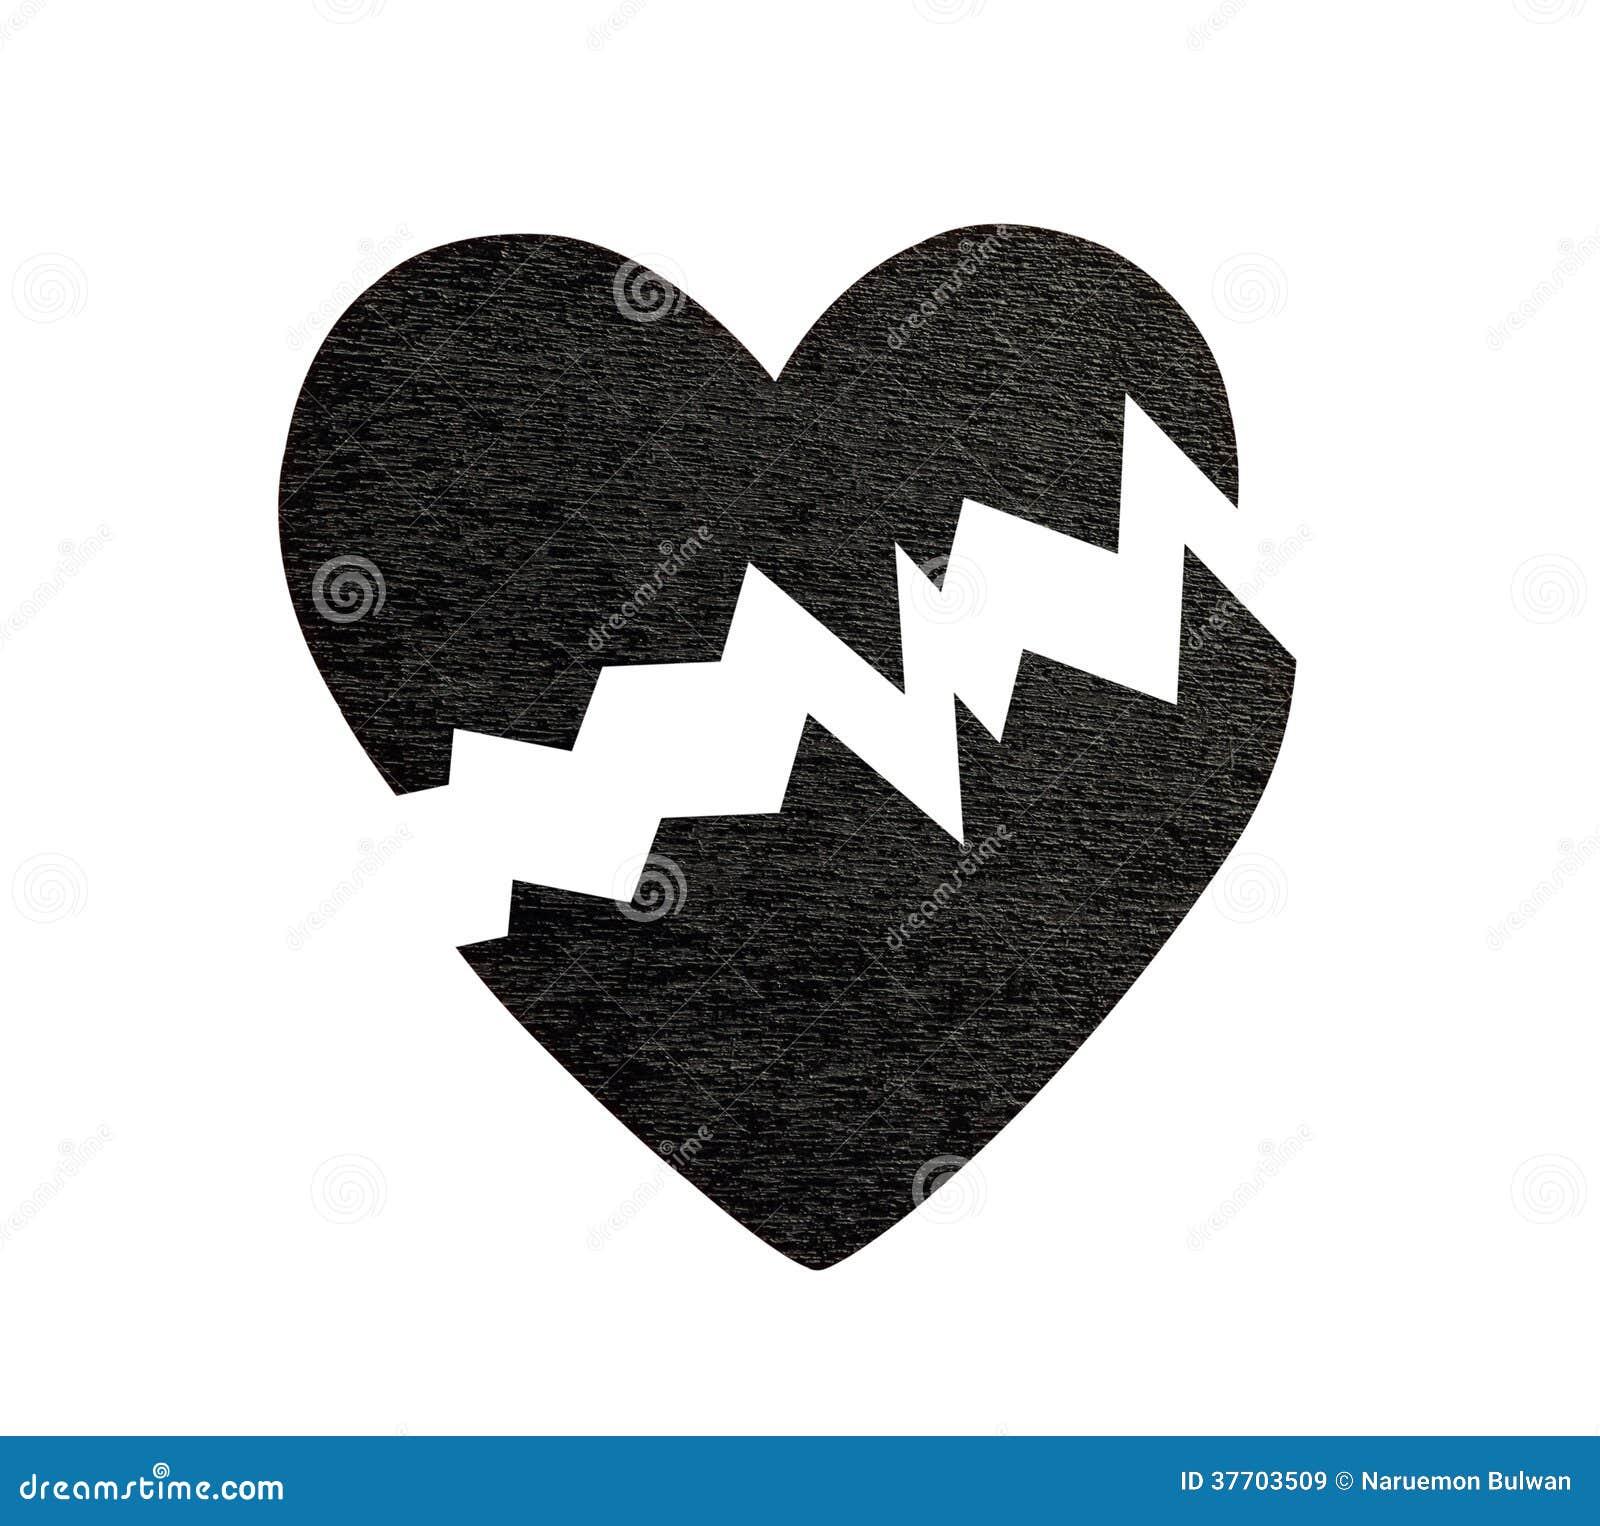 Broken Black Heart Royalty Free Stock Images - Image: 37703509